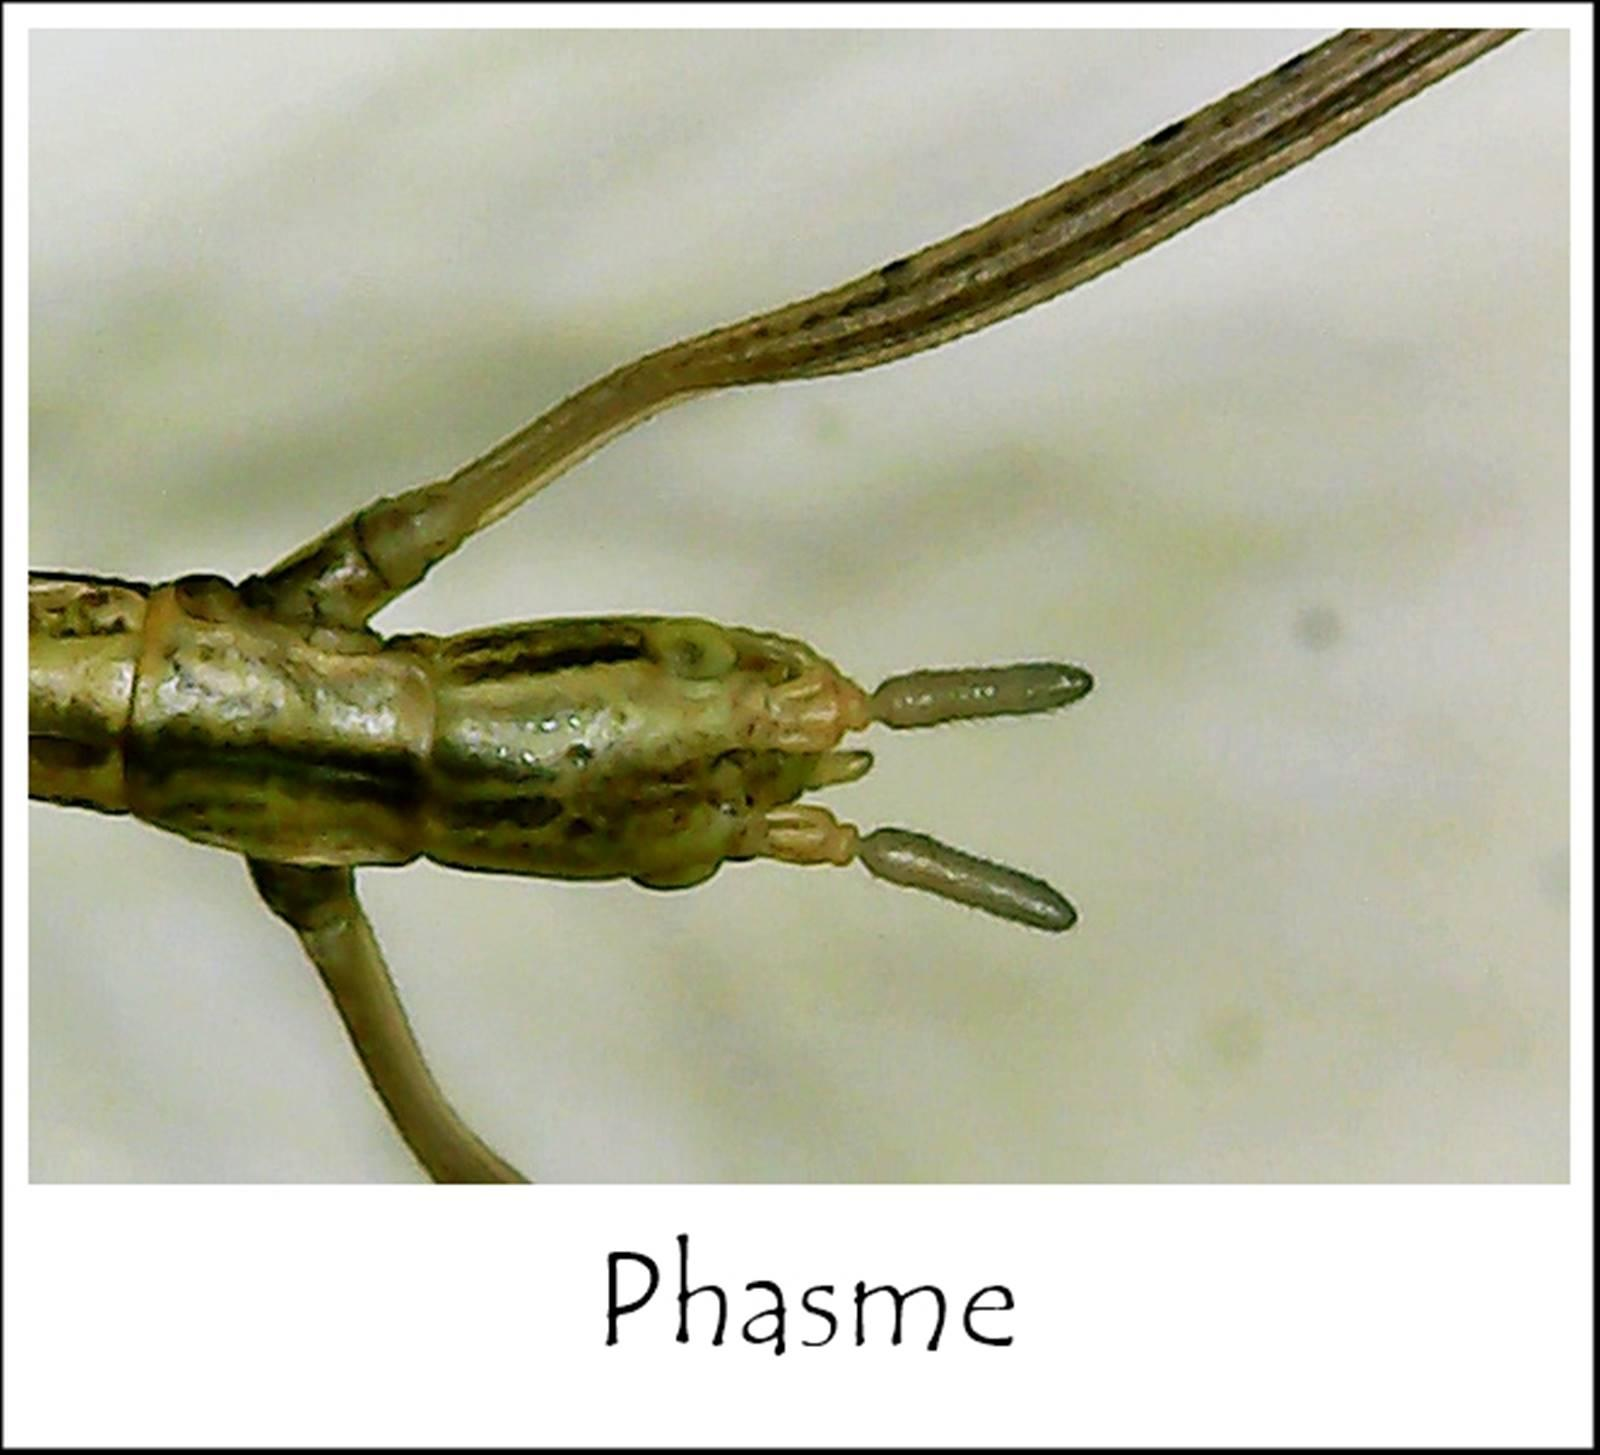 Phasme